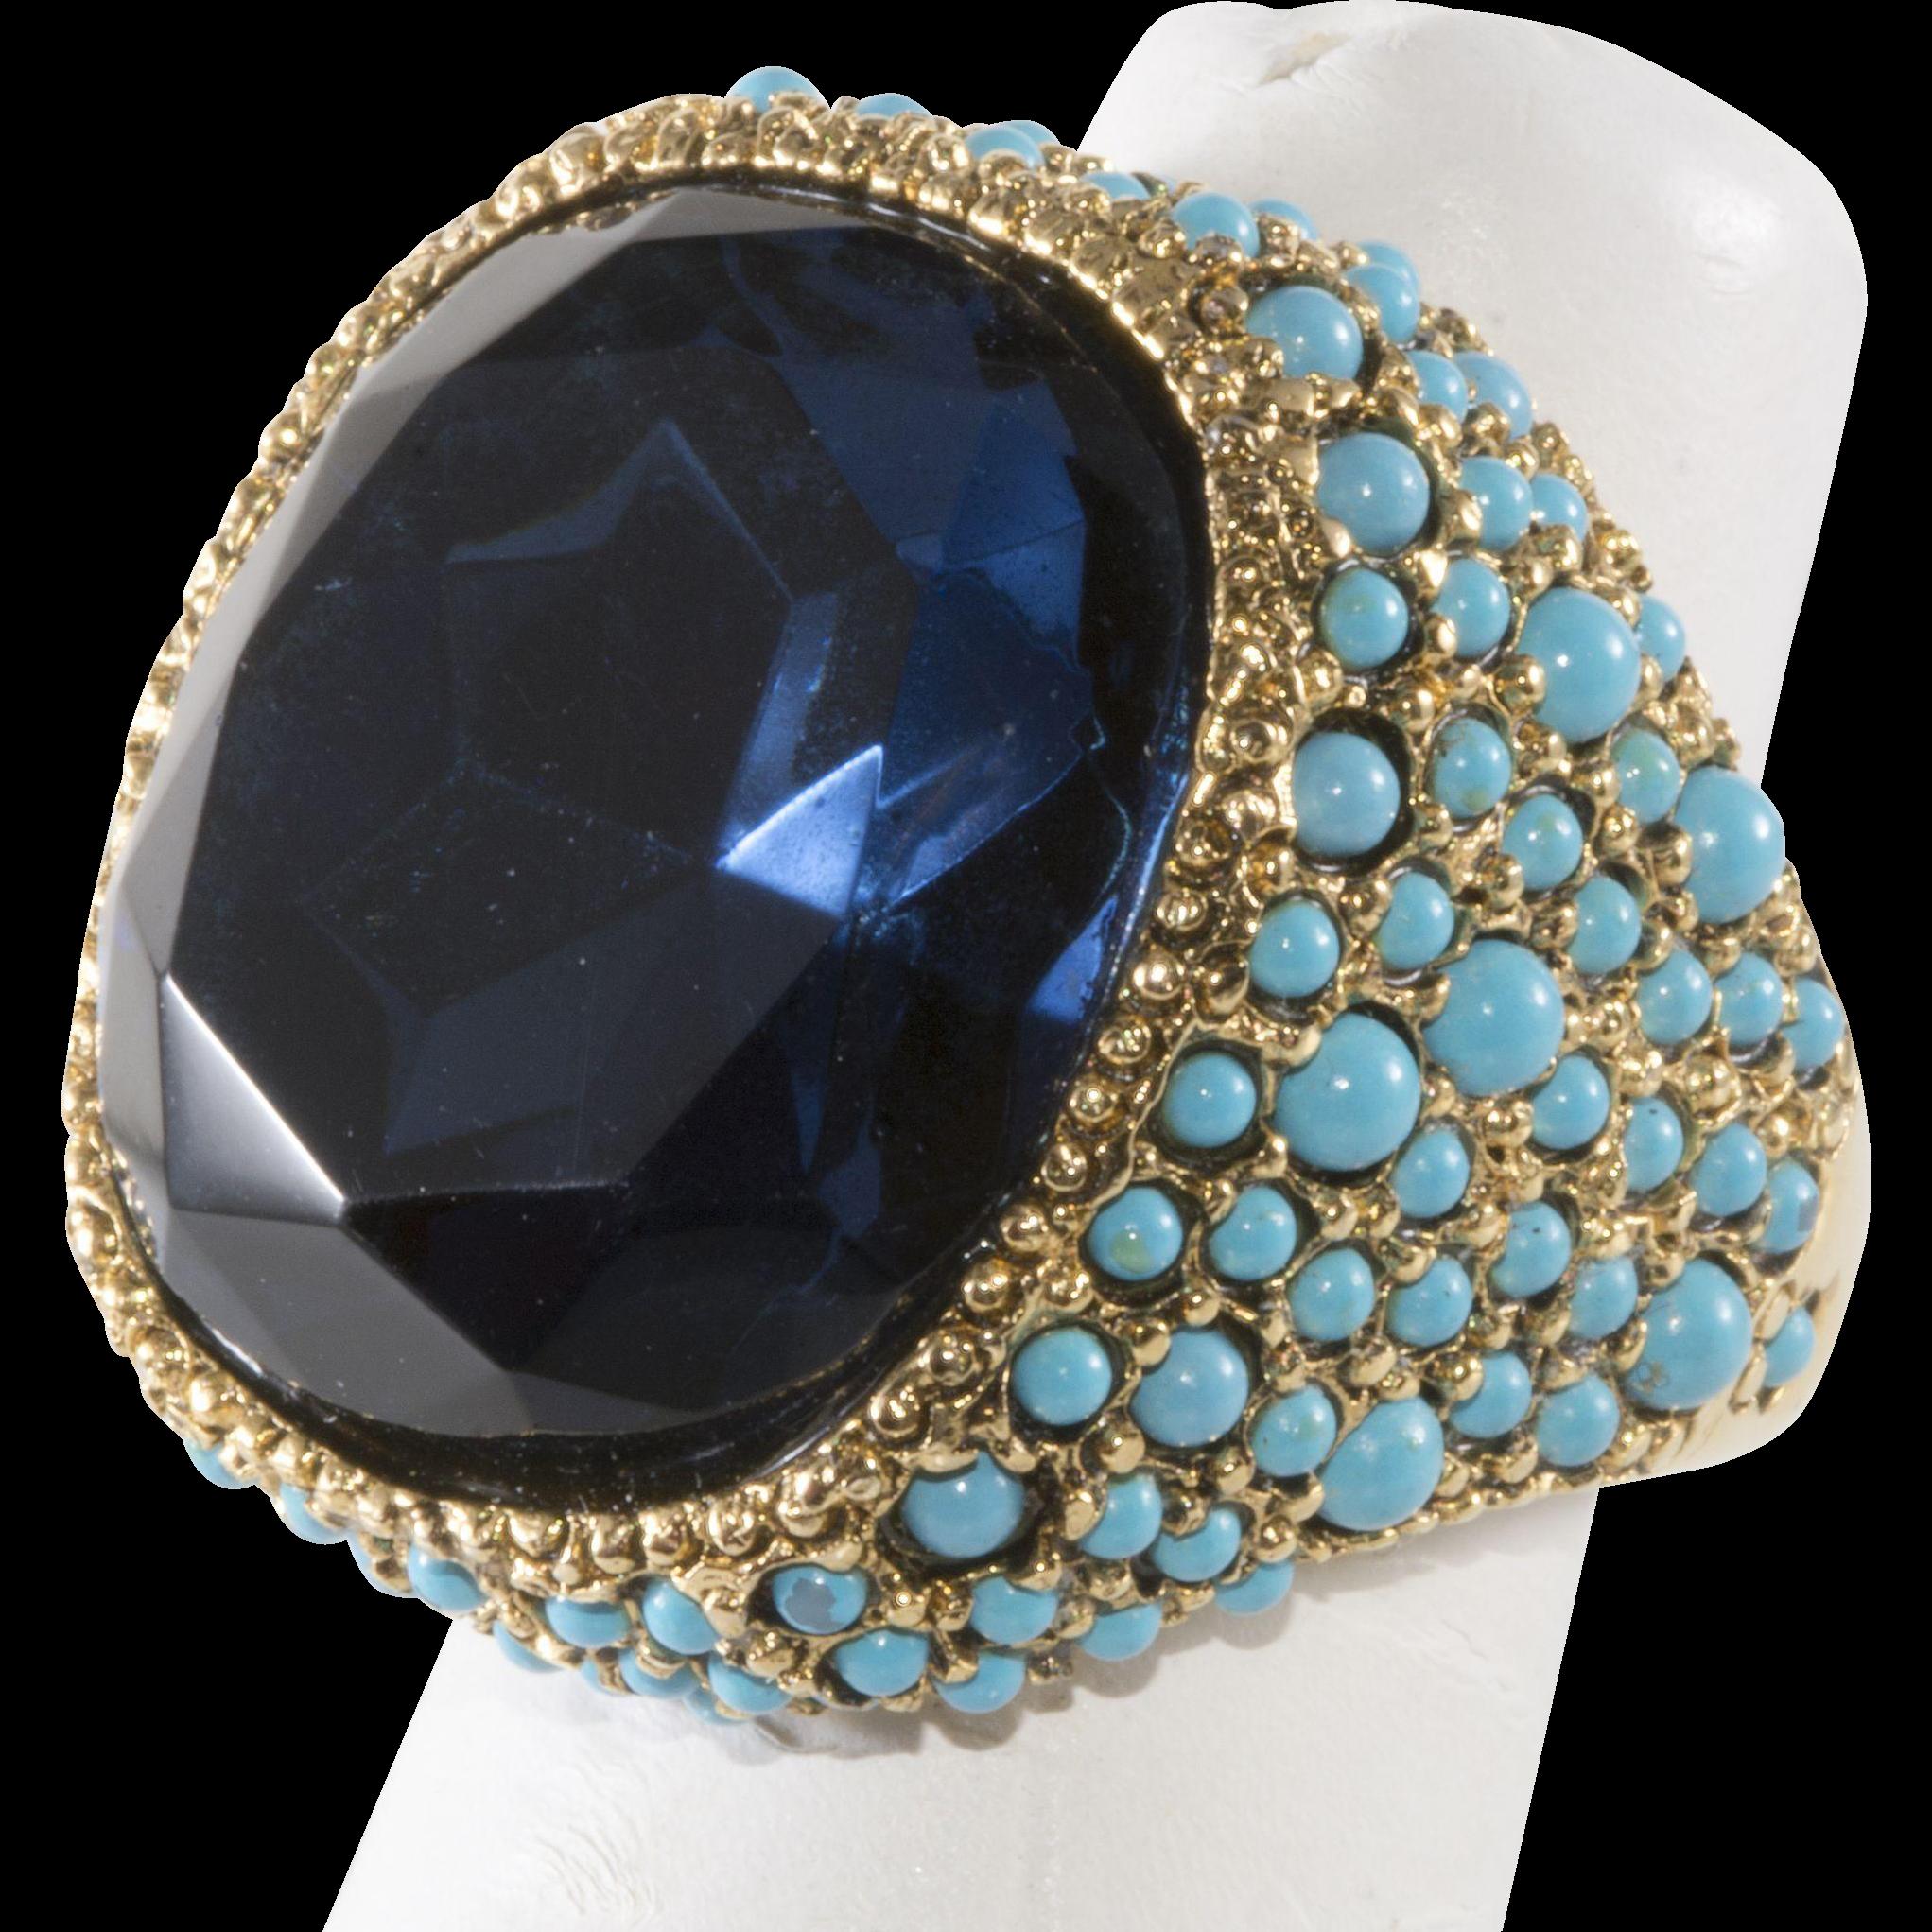 Kenneth Jay Lane Ring Sapphire Blue Rhinestone Turquoise Blue Beads K.J.L.